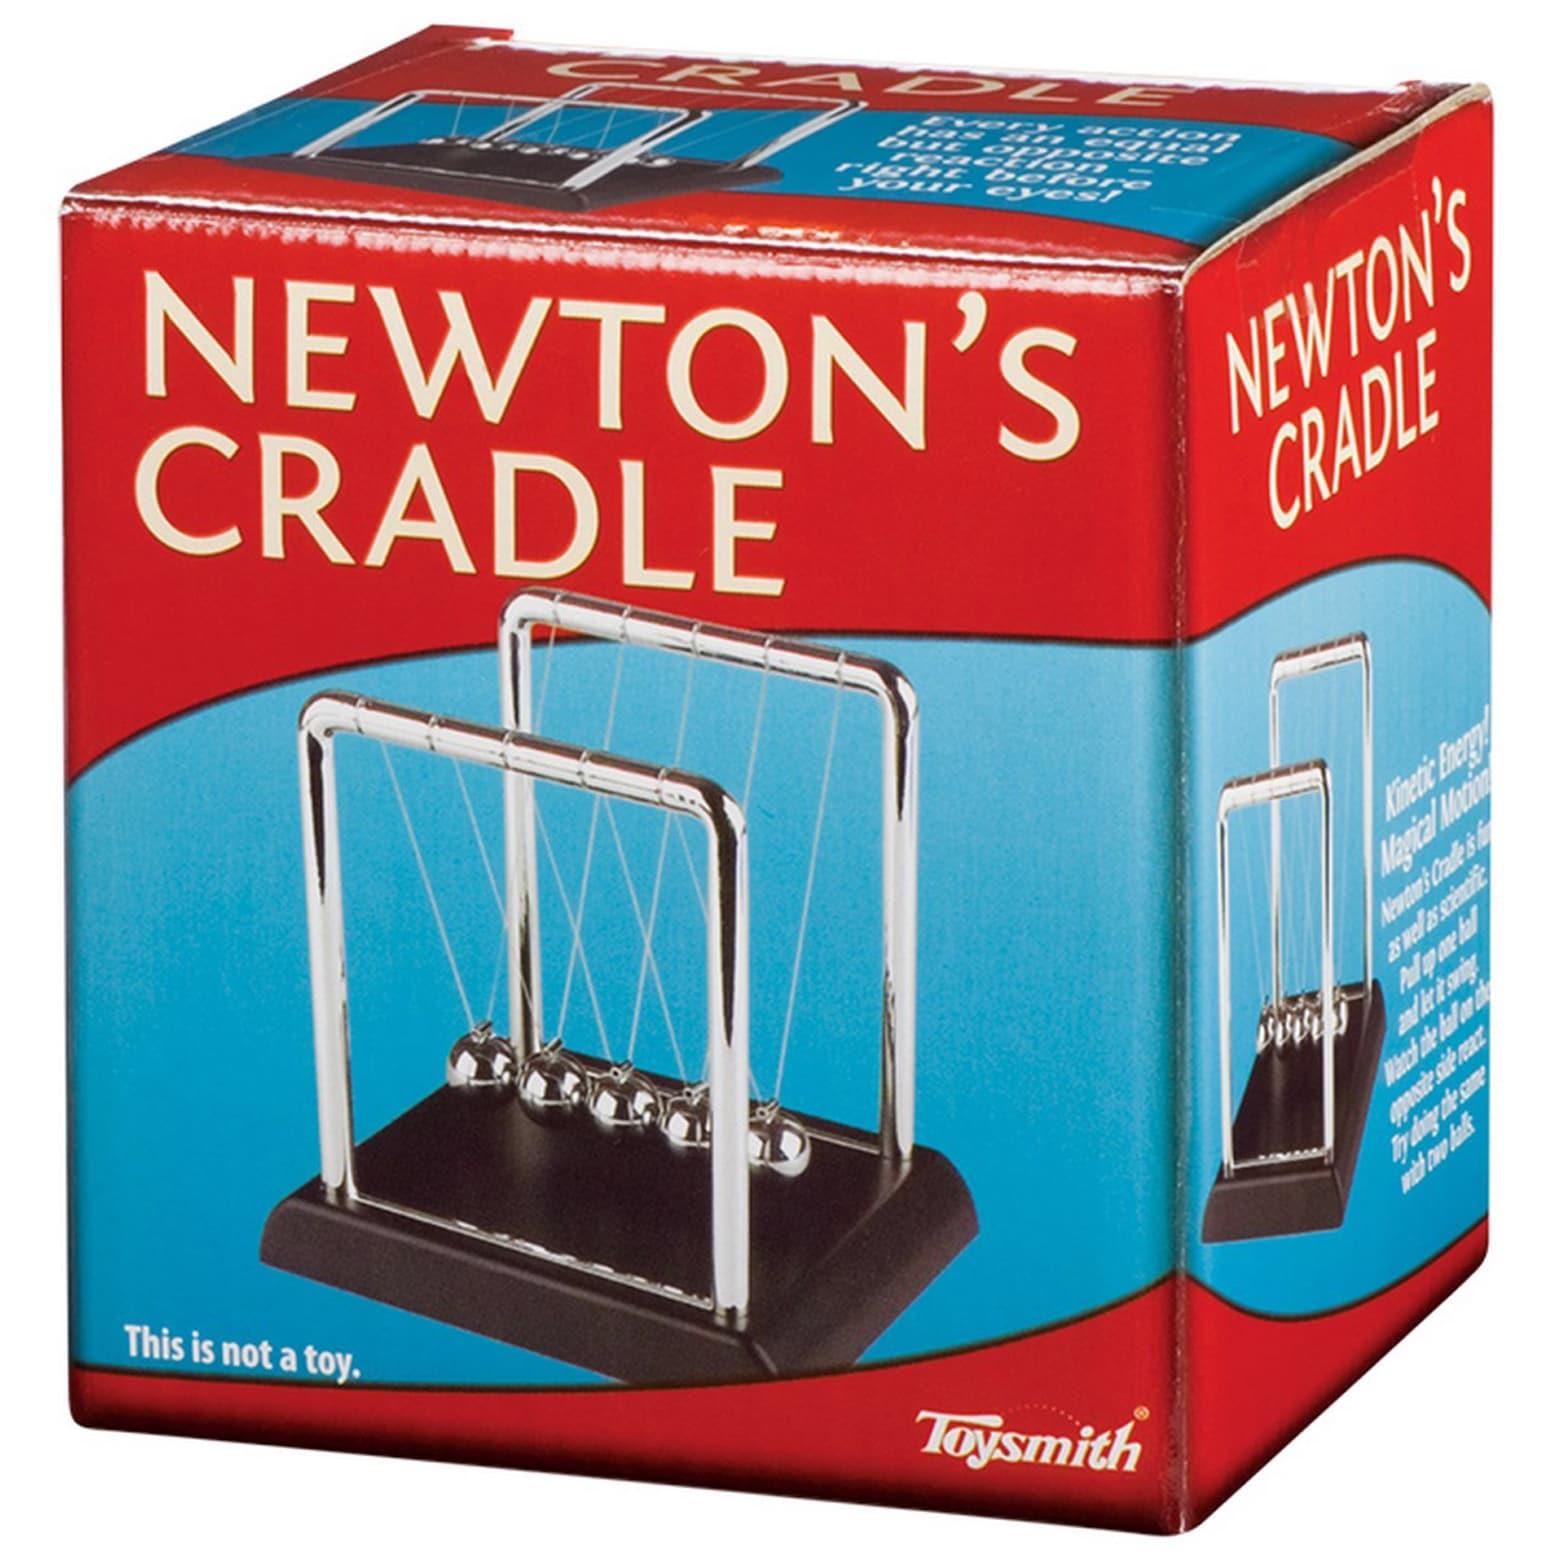 Toysmith Newton's Cradle Physics Toy (G085761318830), Bro...